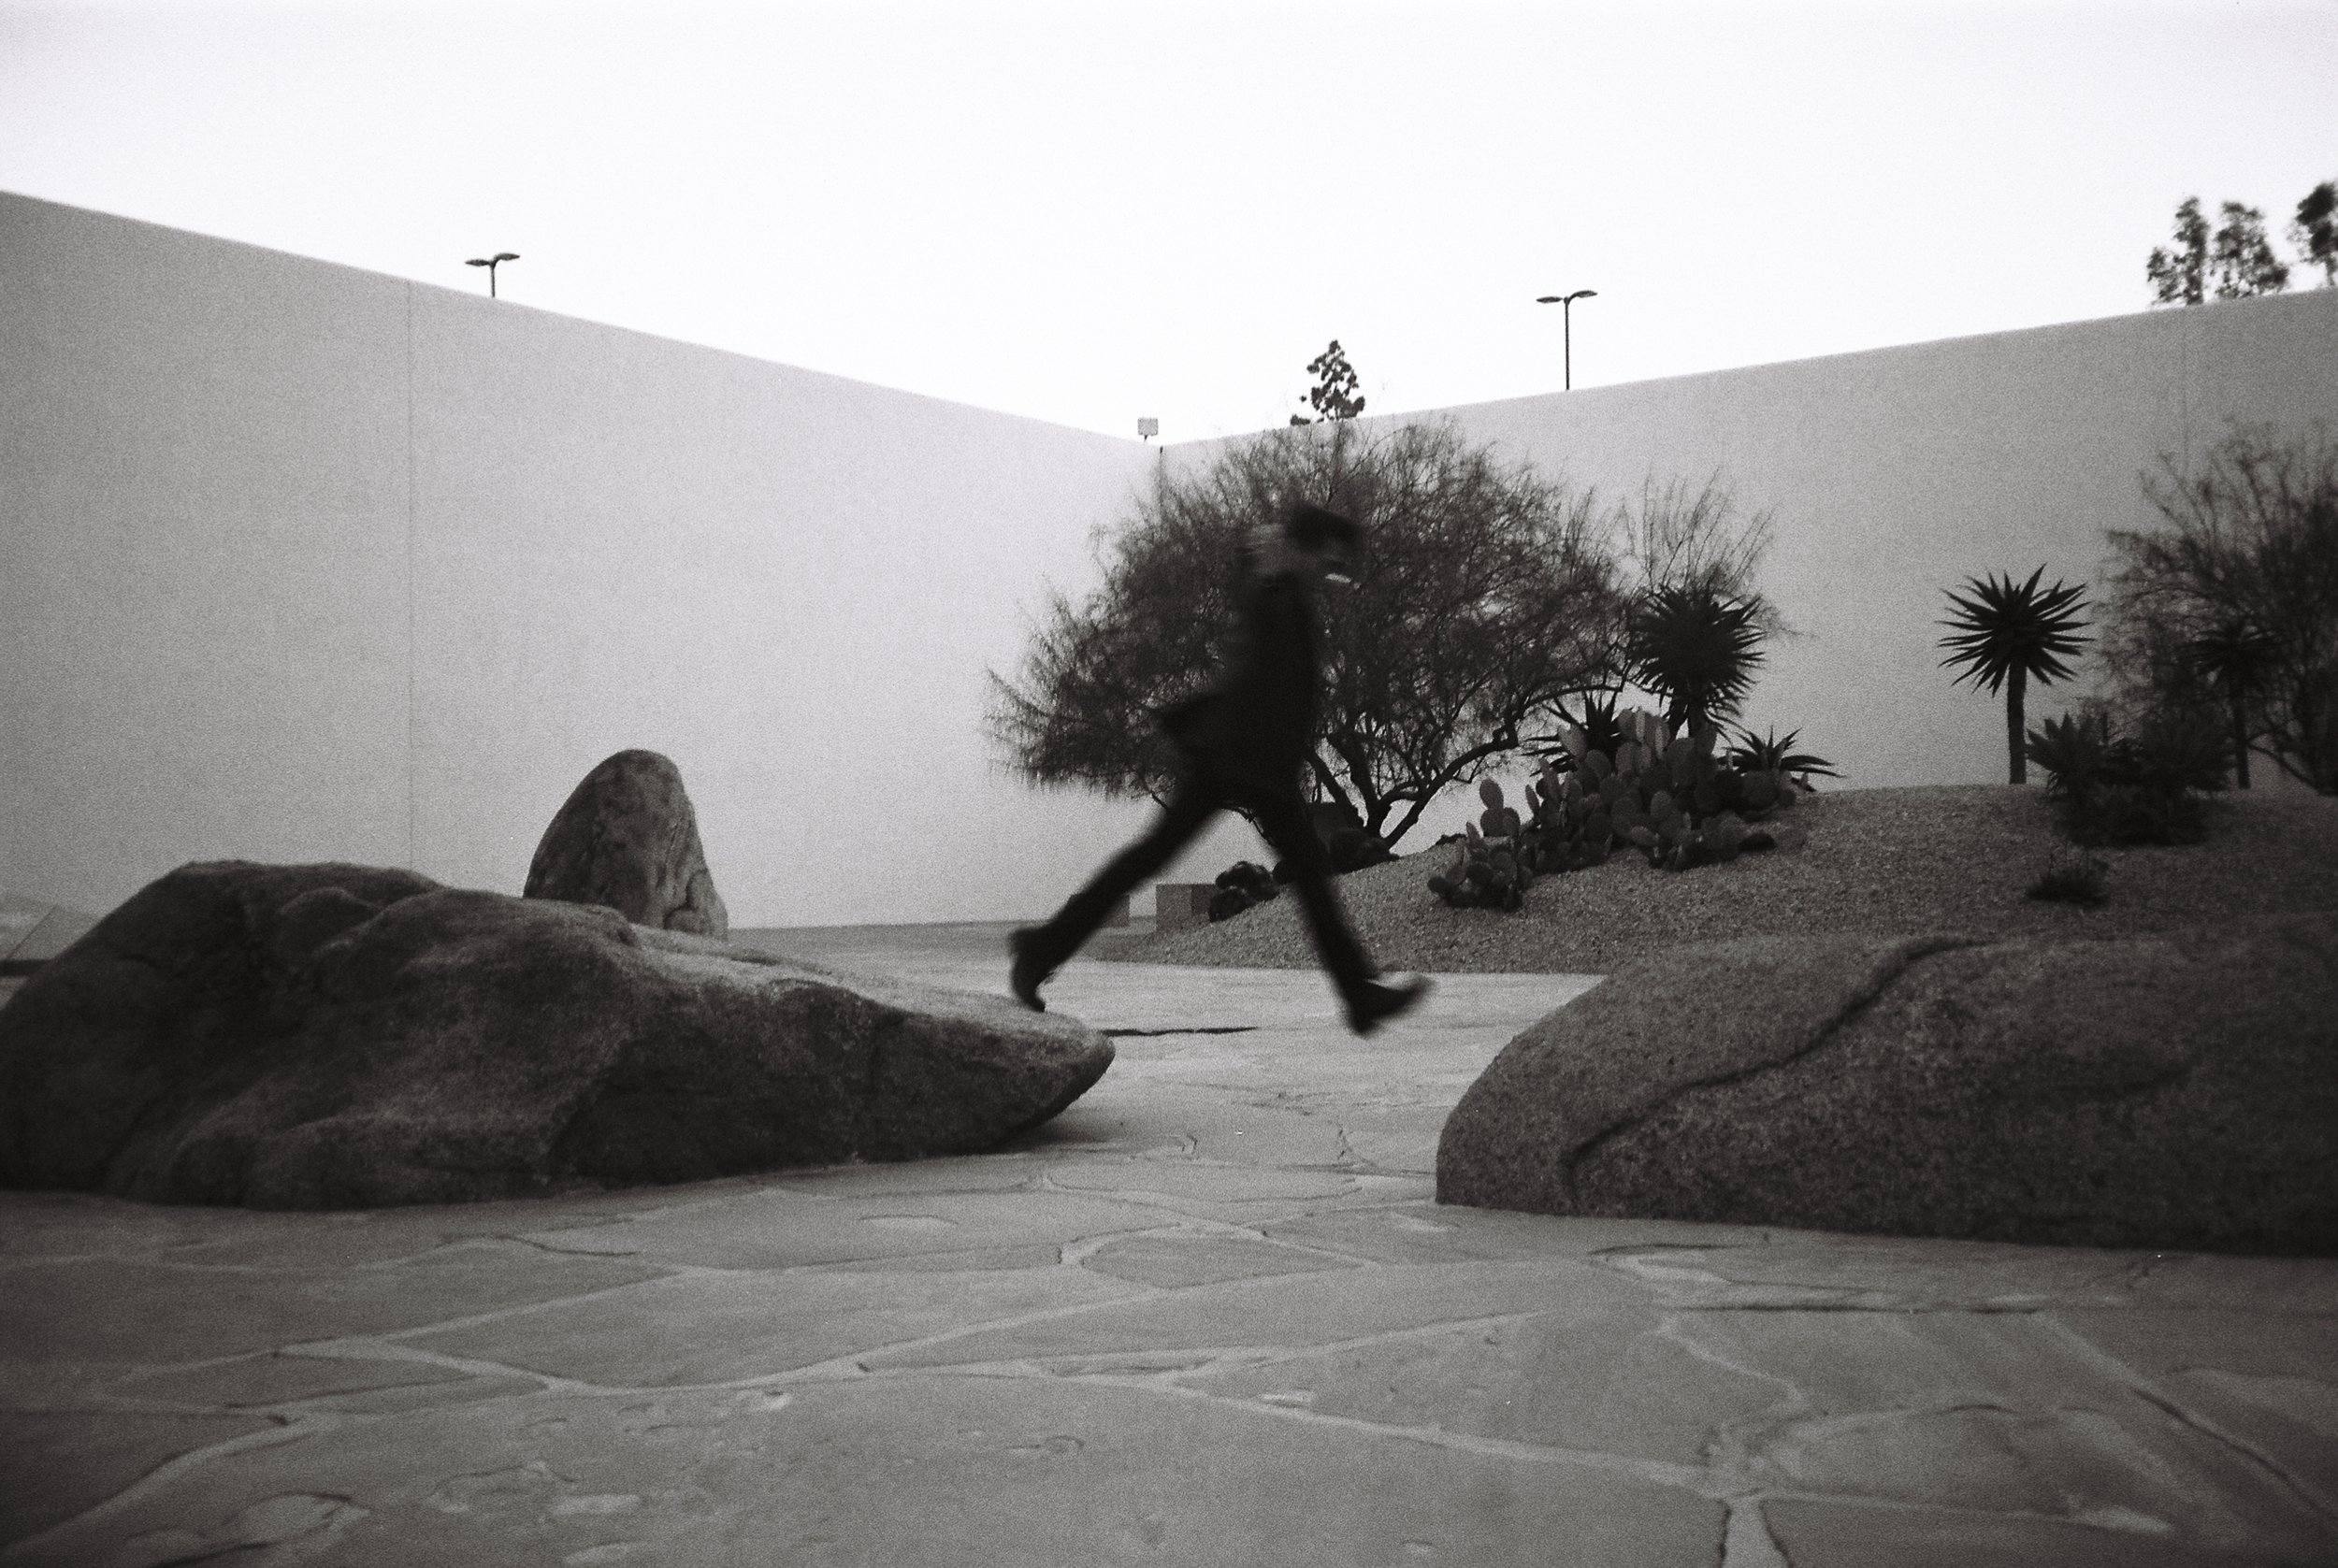 Ravi jumping, Irvine, 2019.